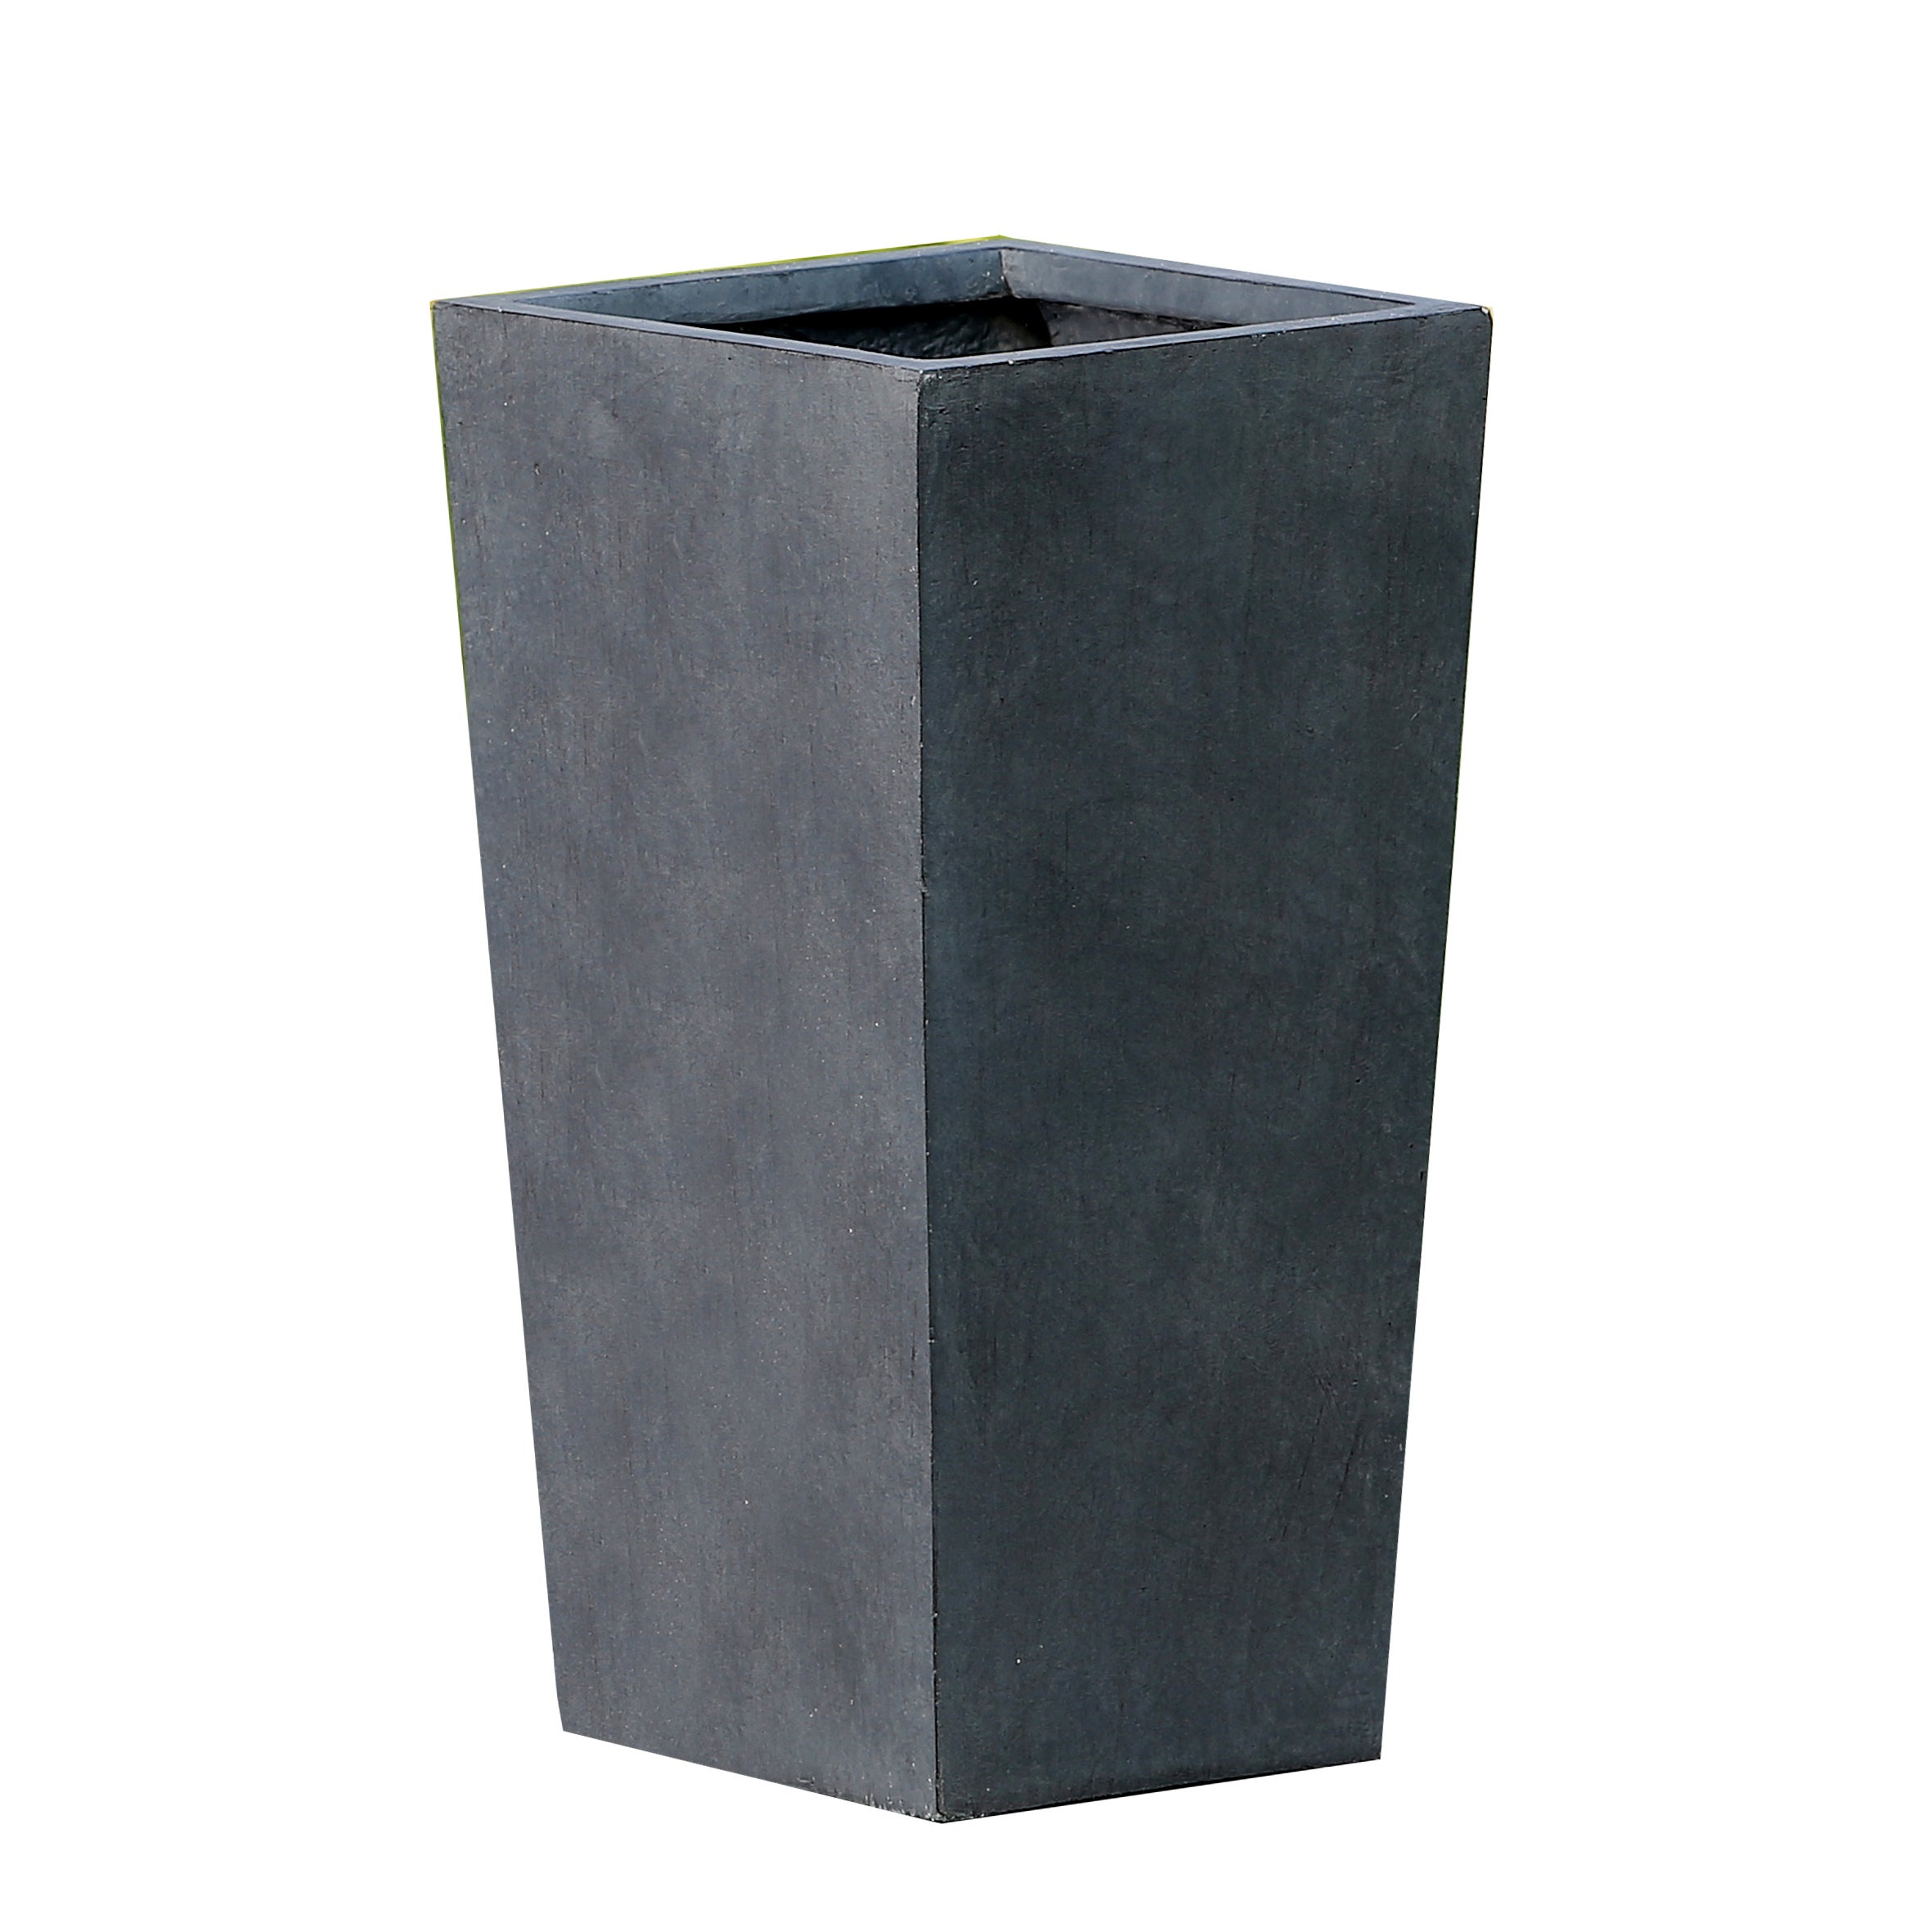 Stone Finish Flower Pot Planter Tall Narrow Modern Elegant Fiberstone Grey